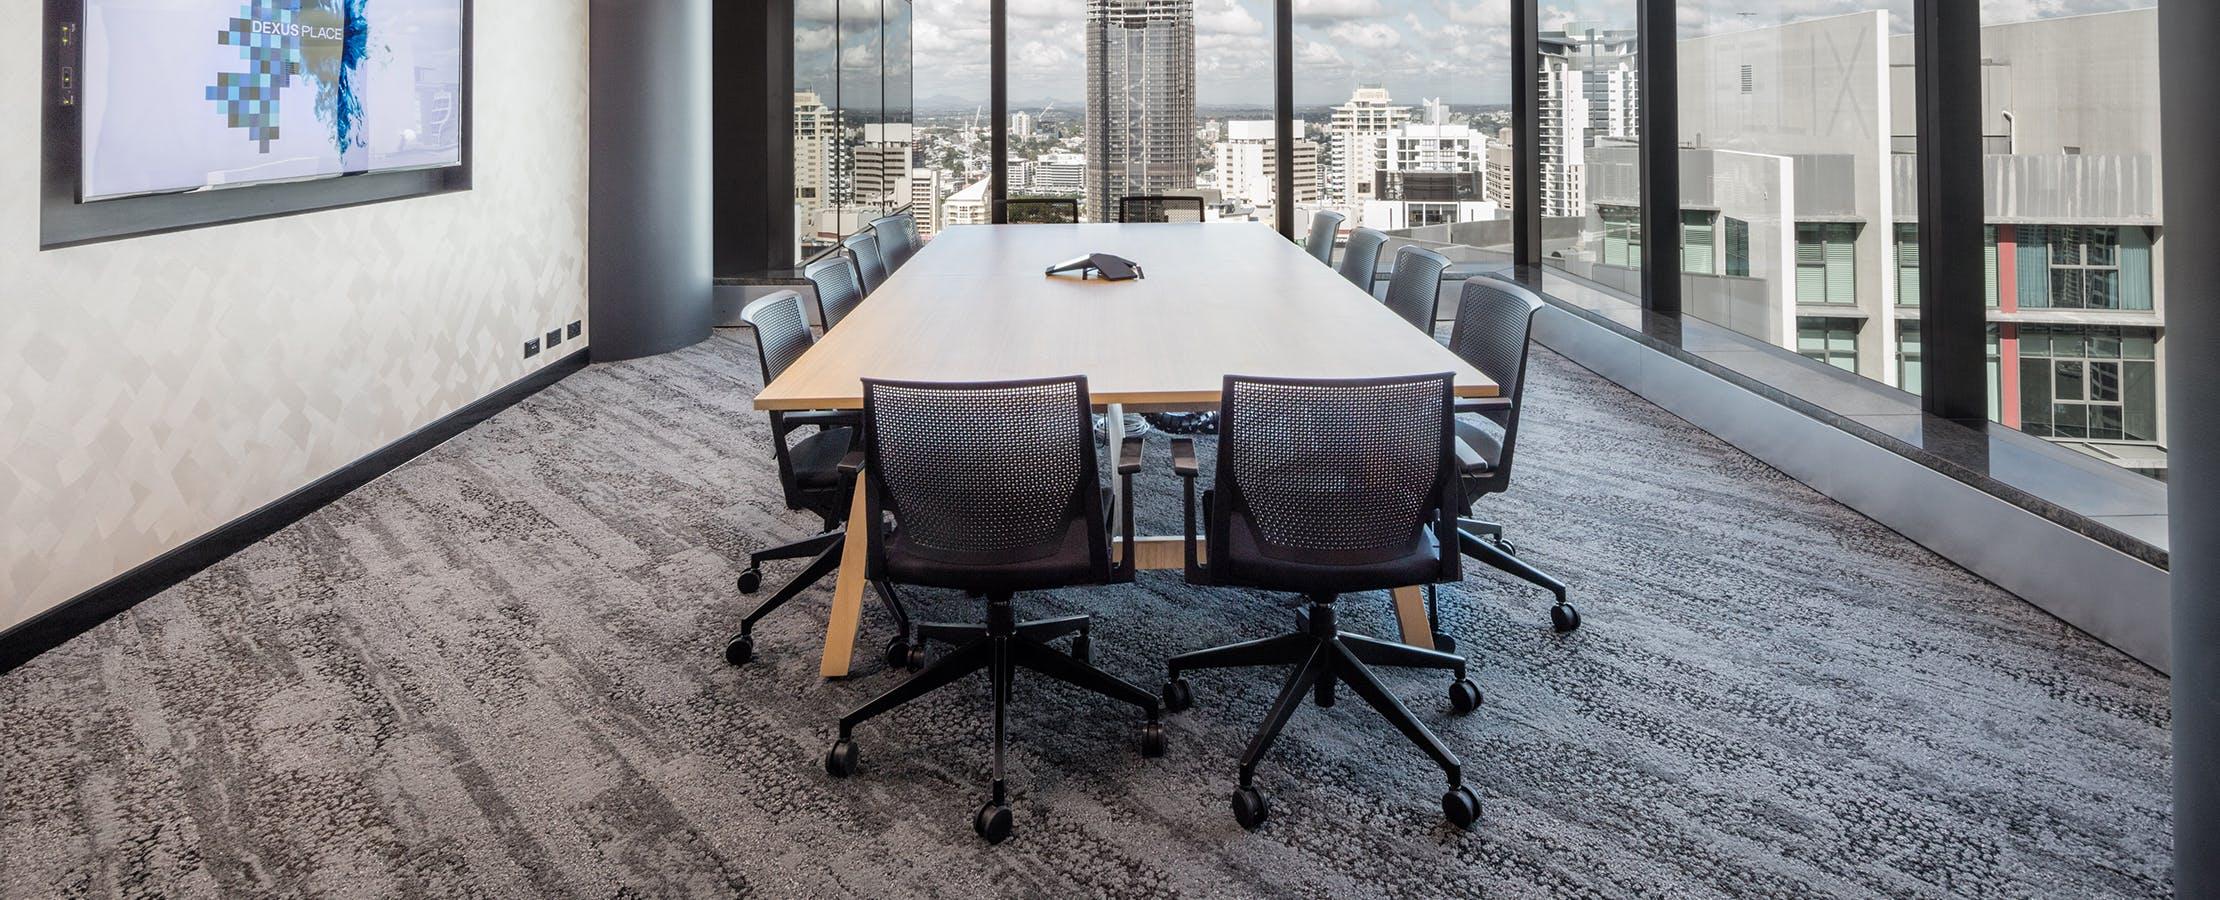 Boardroom, meeting room at Dexus Place, image 1